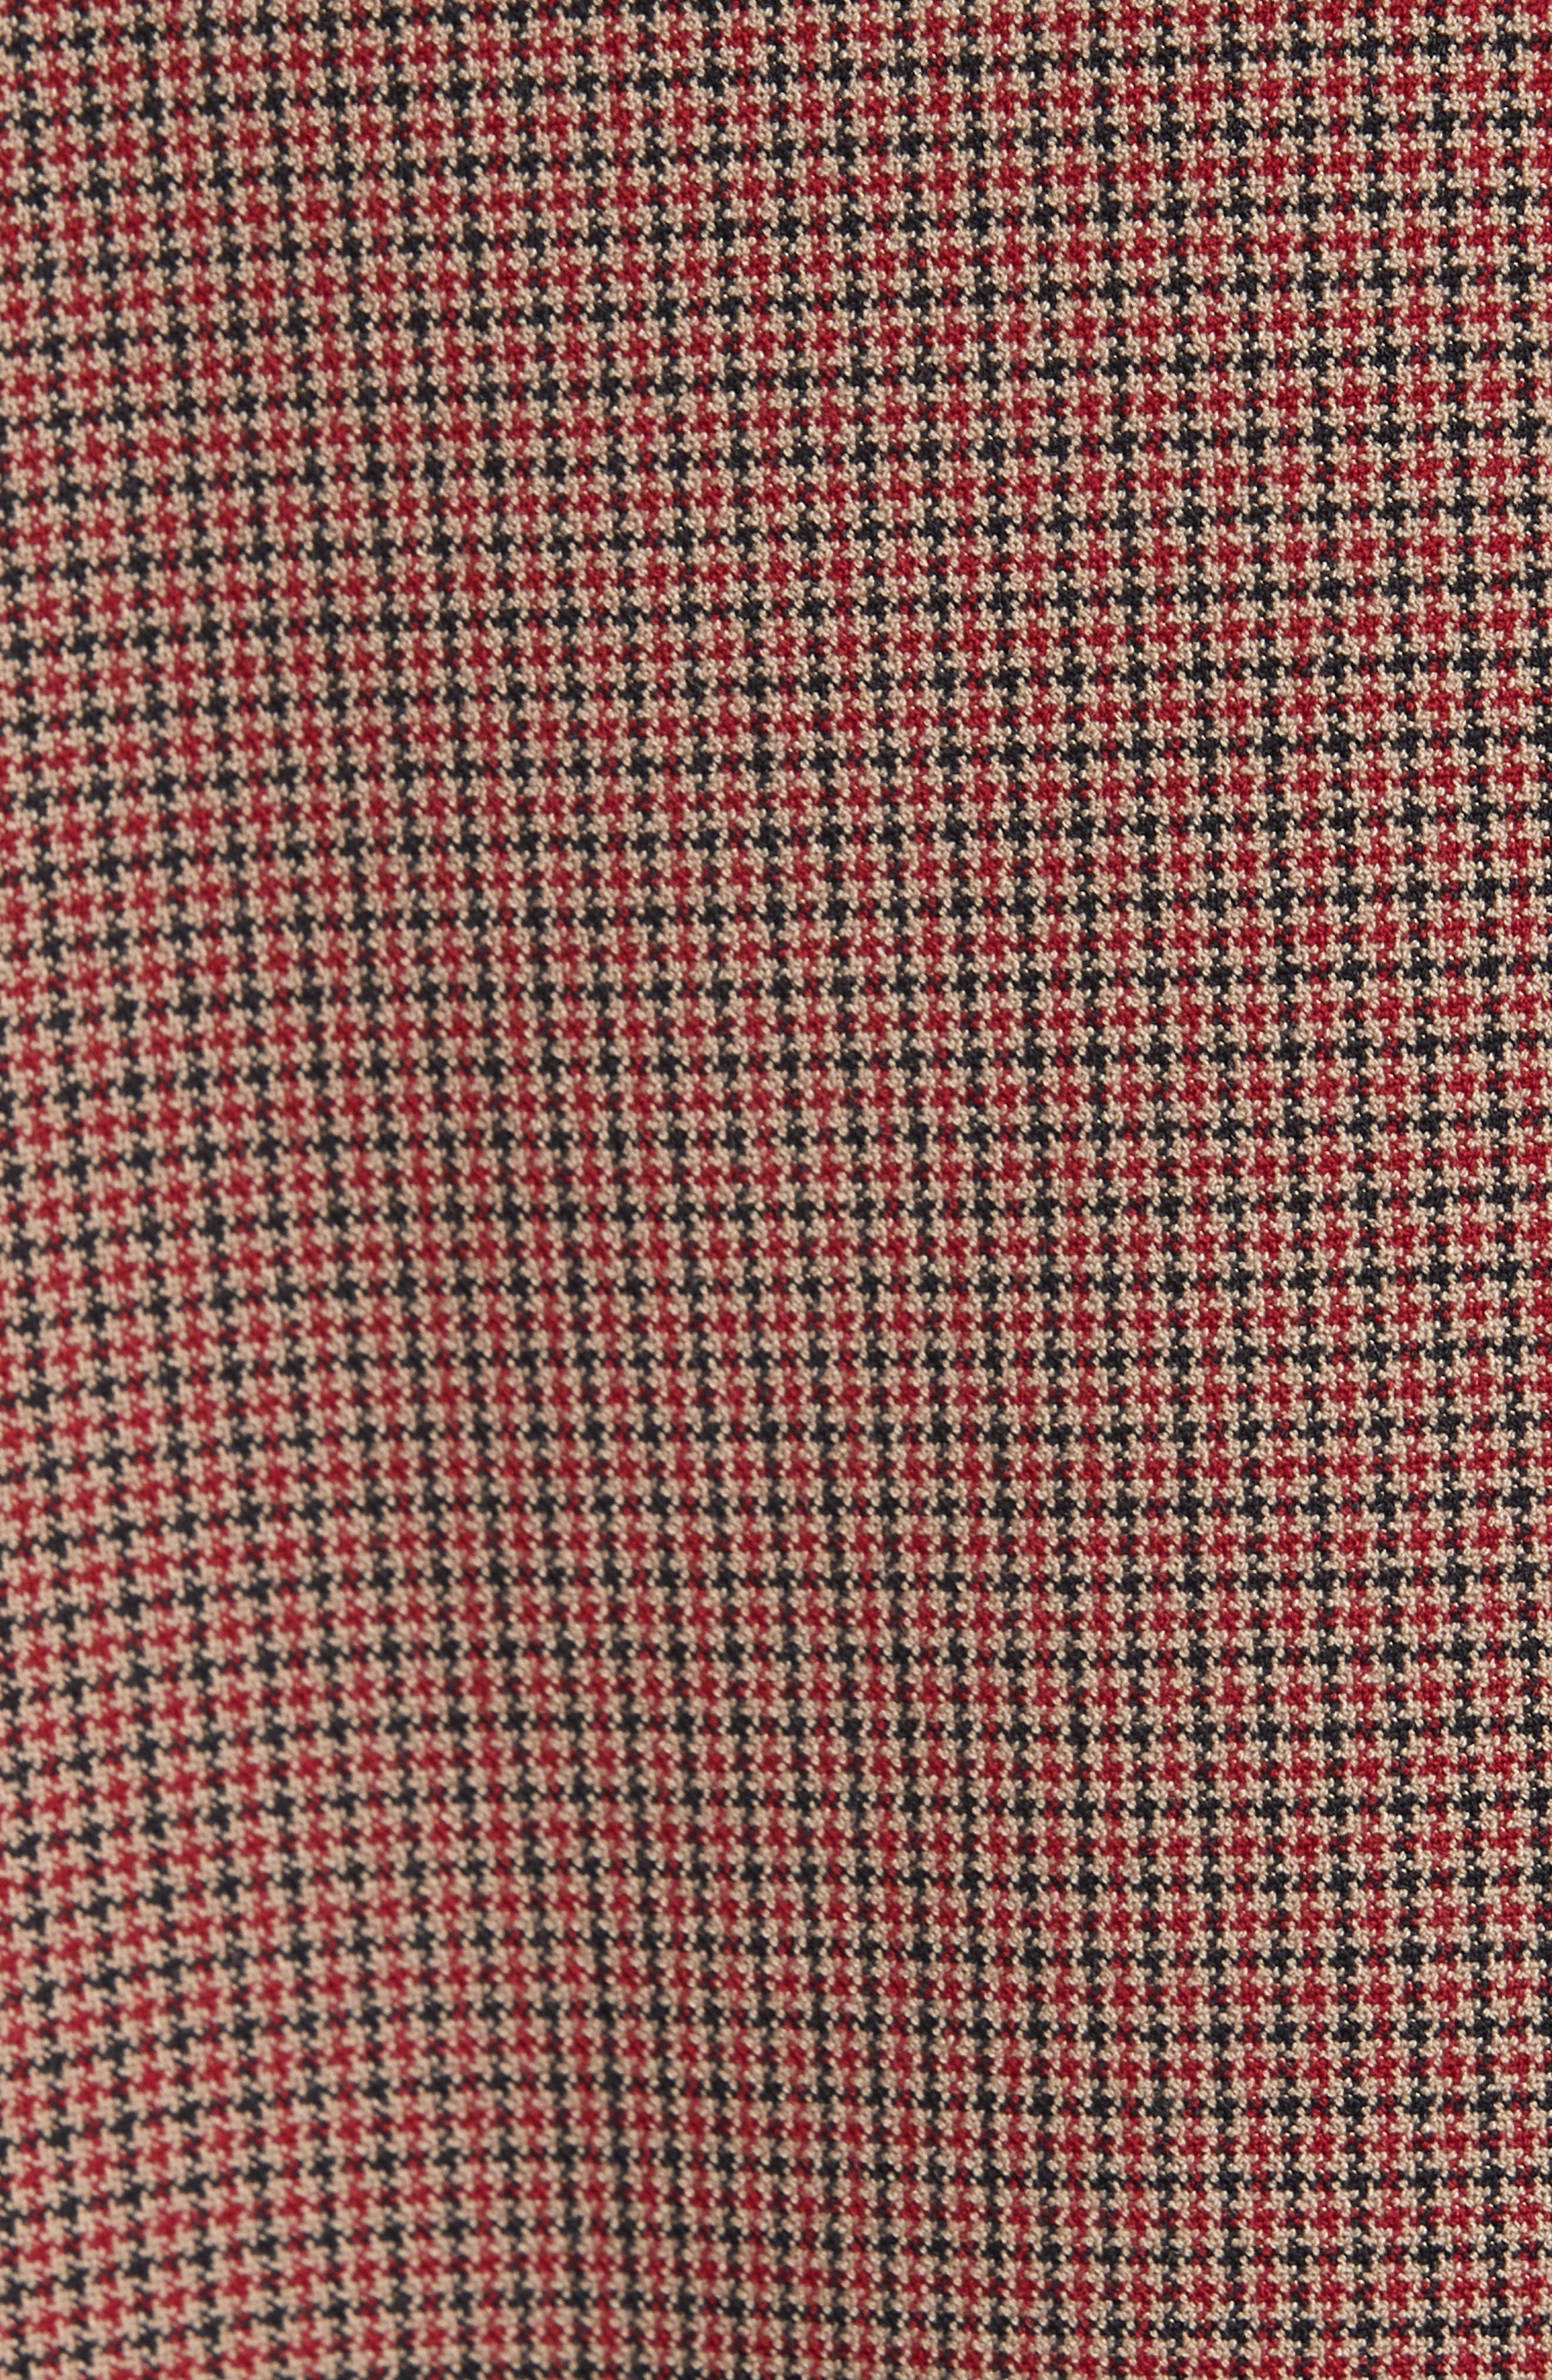 Joliviena Check Suit Jacket,                             Alternate thumbnail 6, color,                             DARK RED CHECK